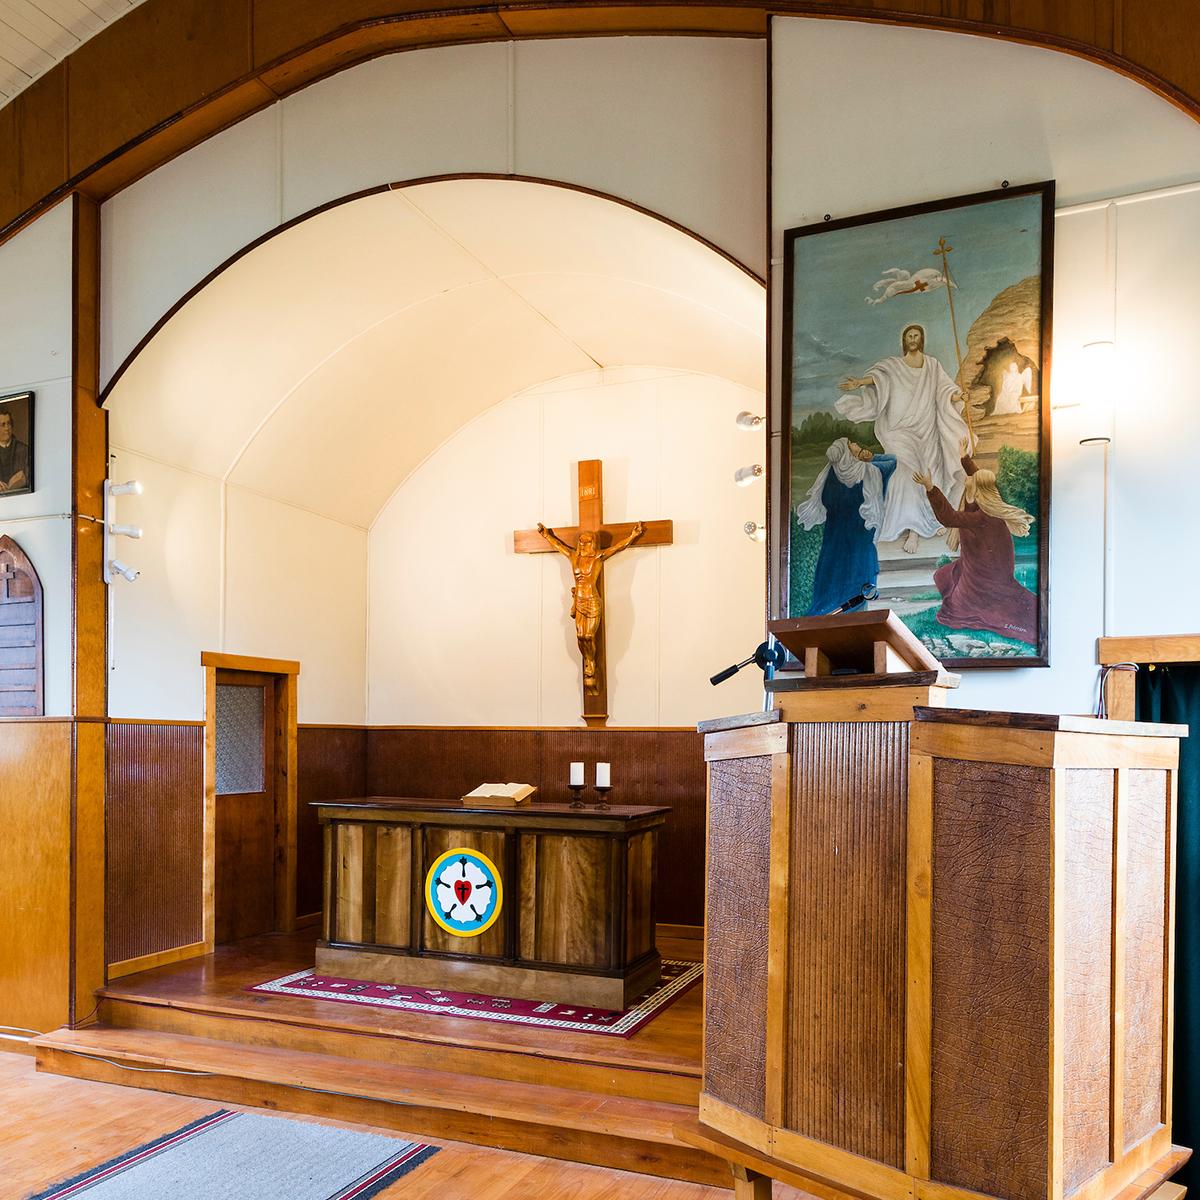 iglesia-luterana-en-nueva-braunau